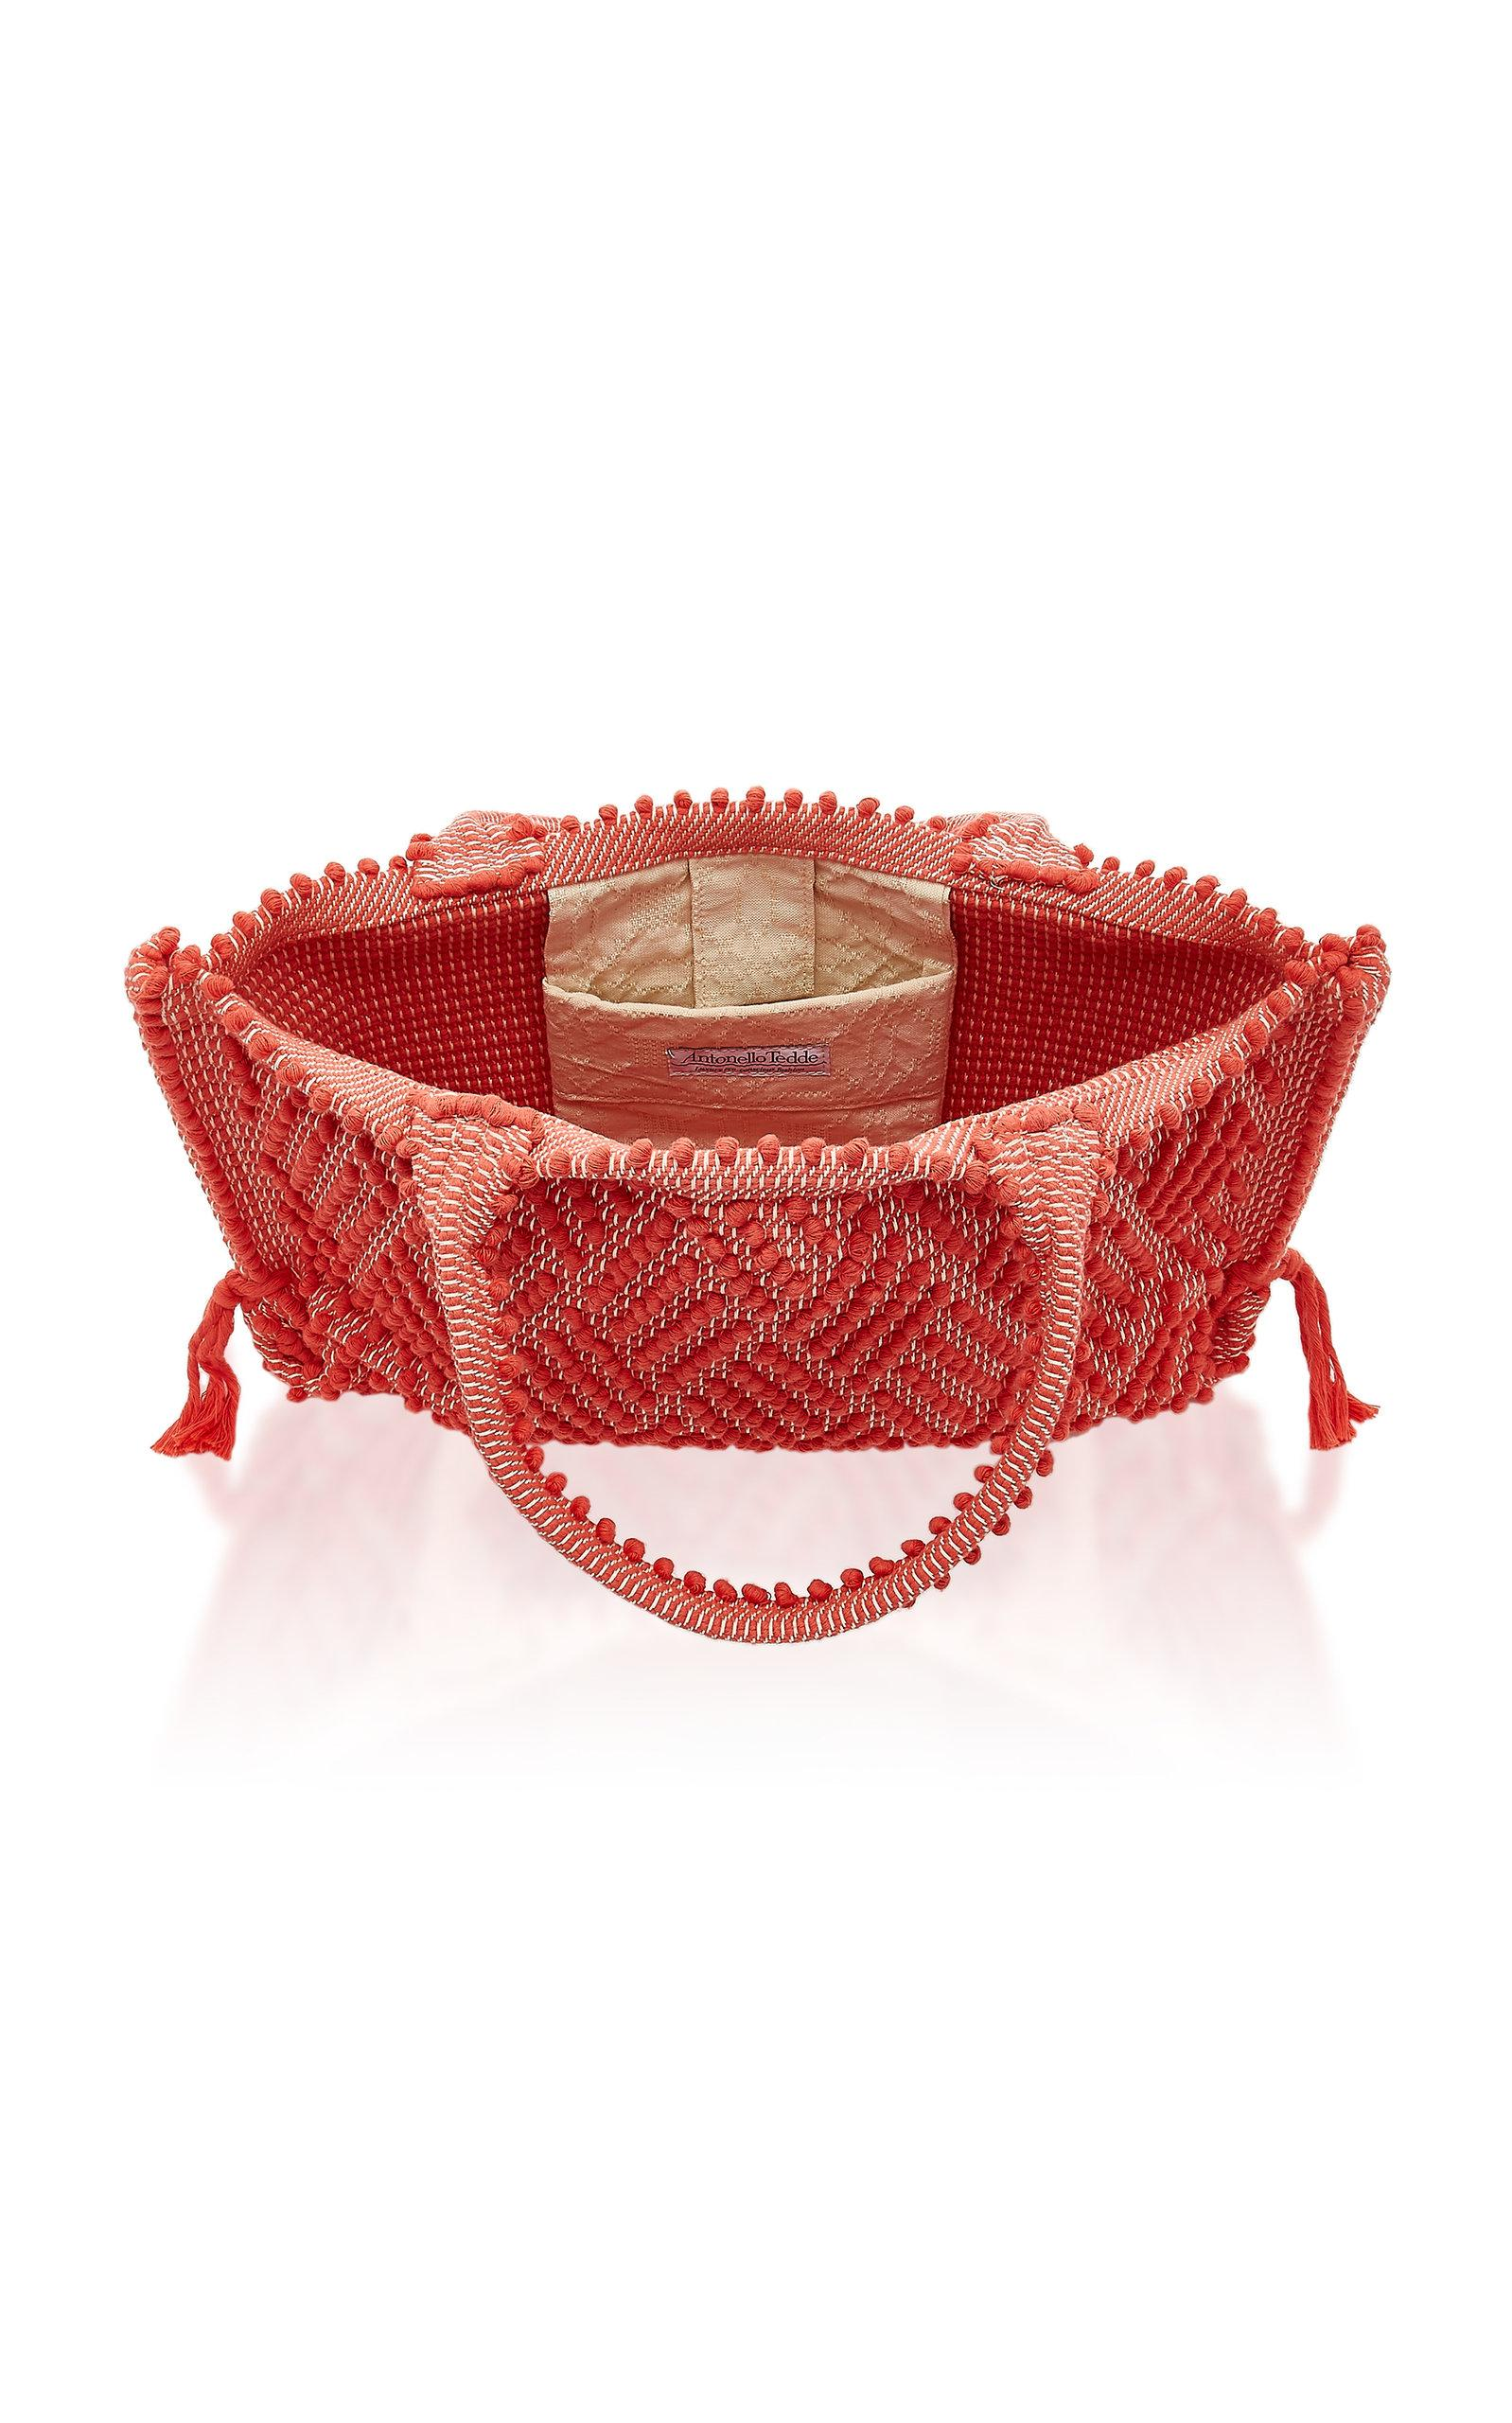 Antonello Capriccioli Medium Cotton Tote in Red